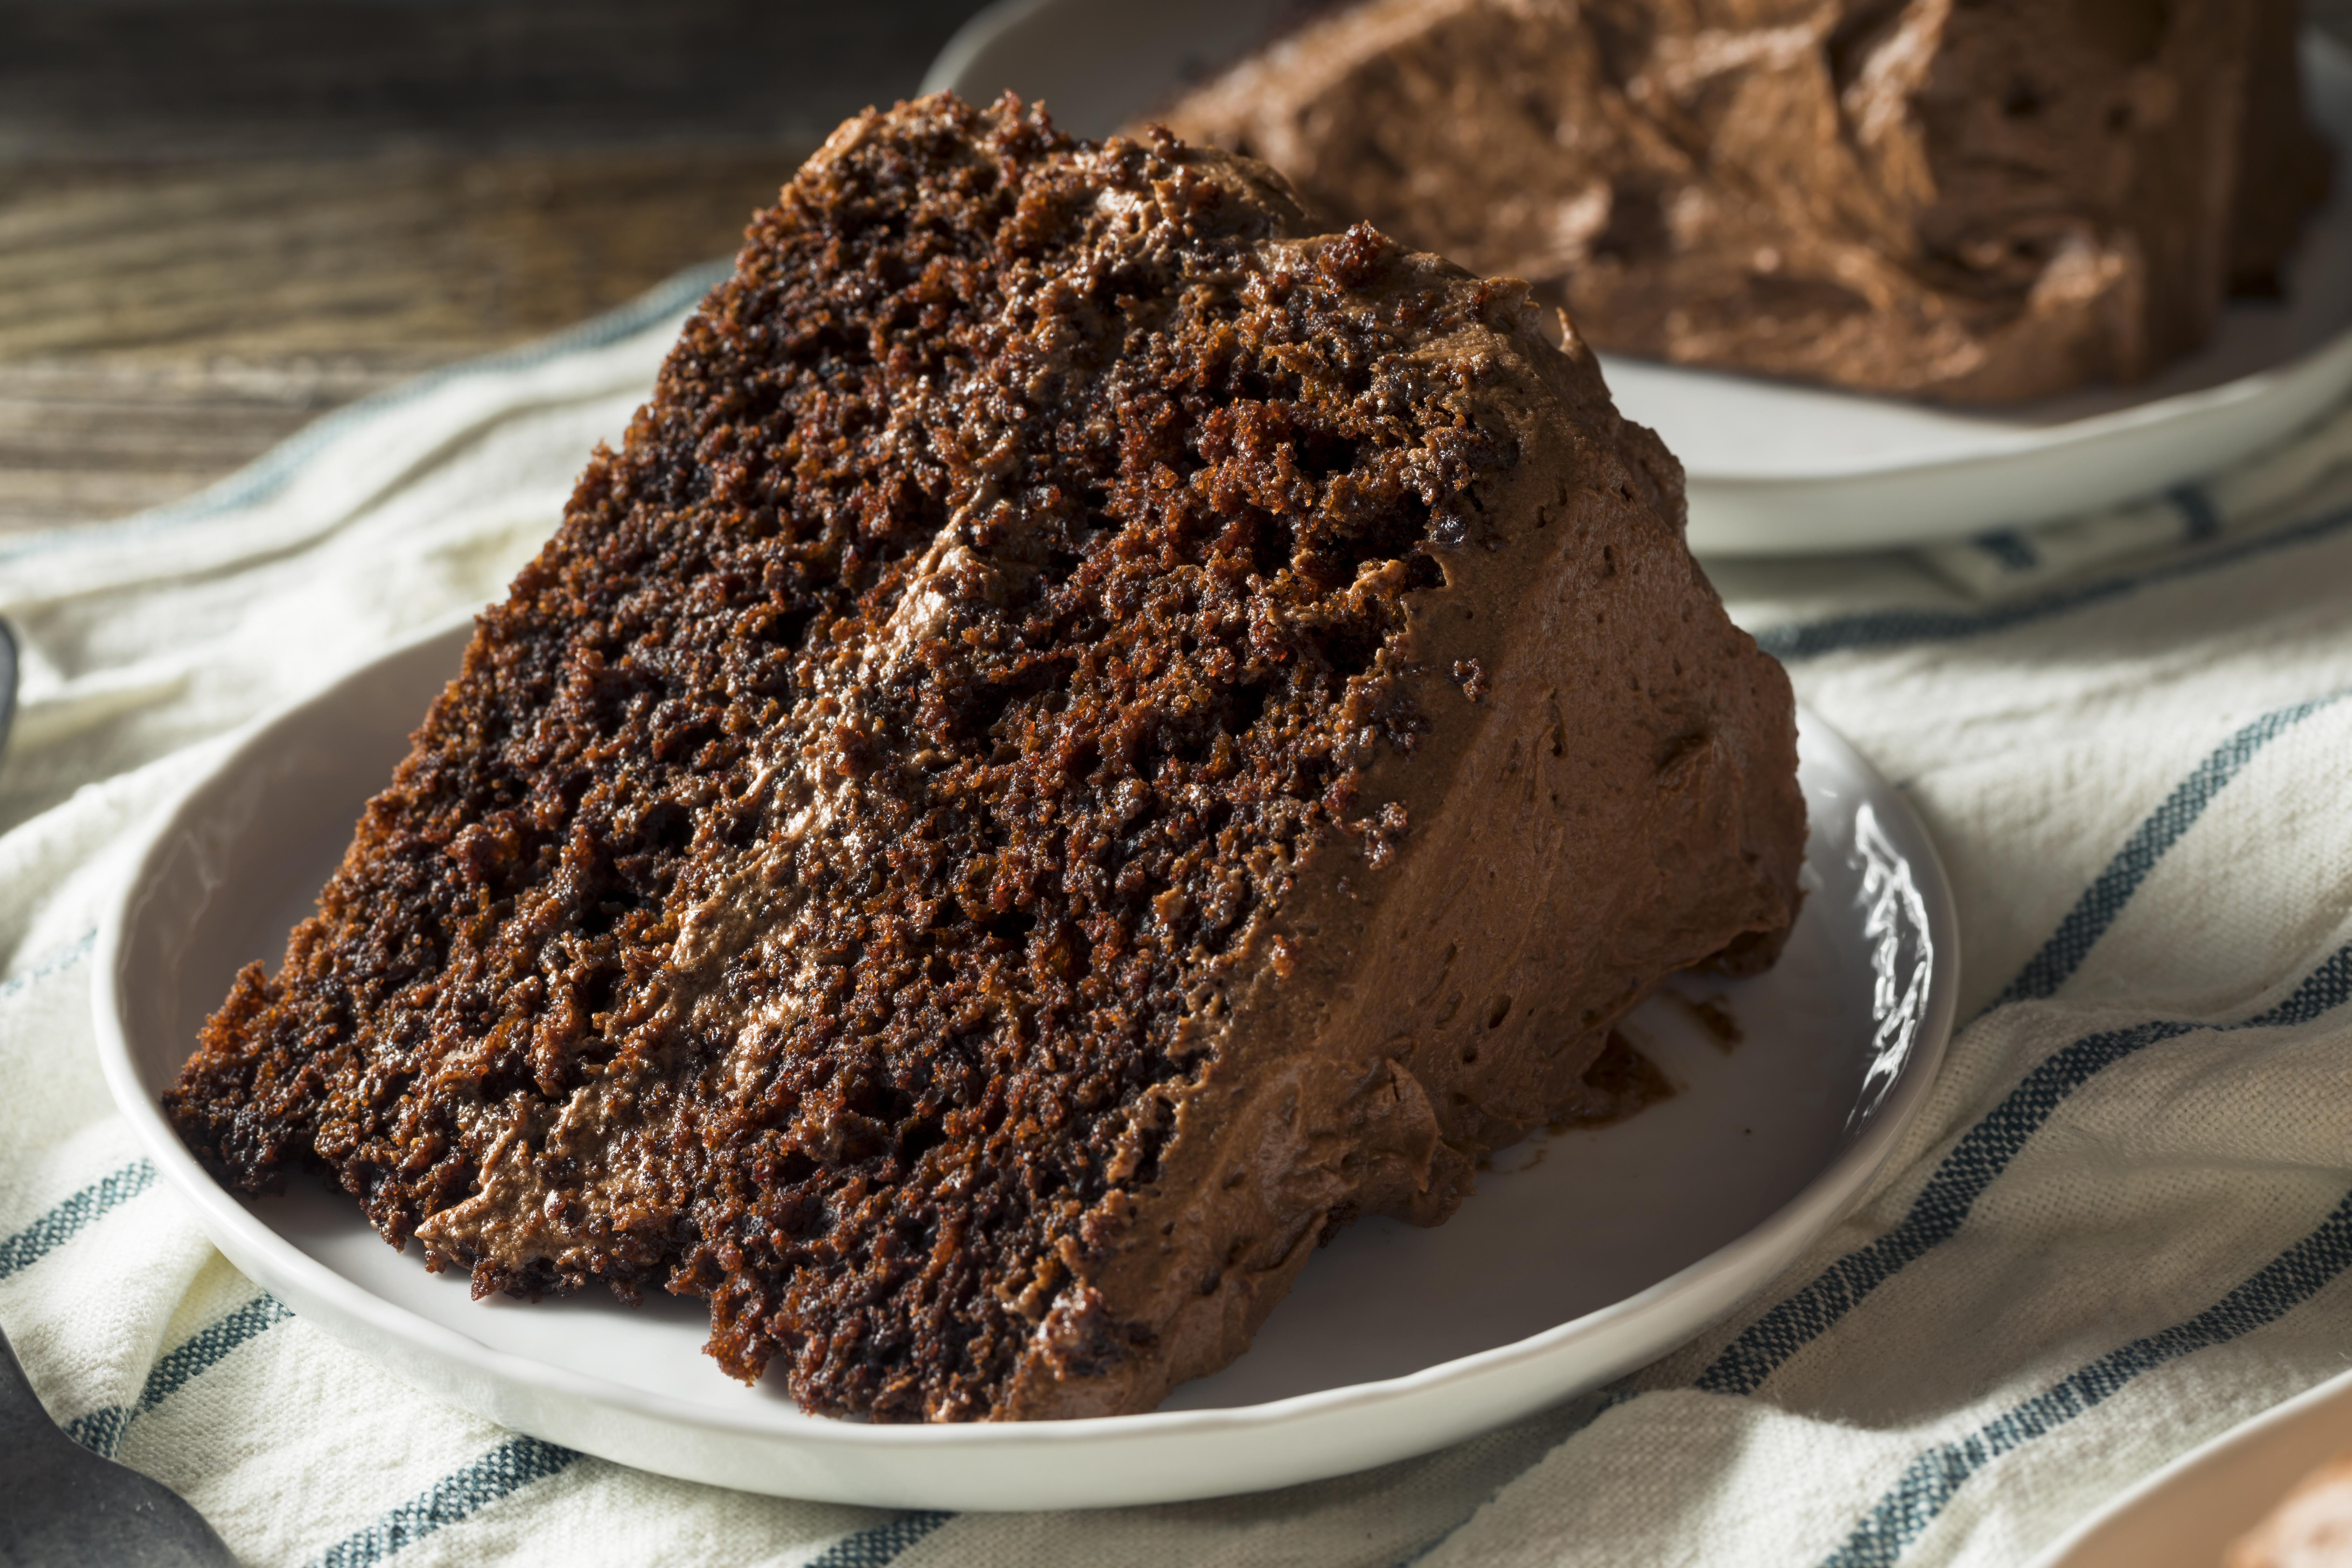 McCormick Chocolate Cake